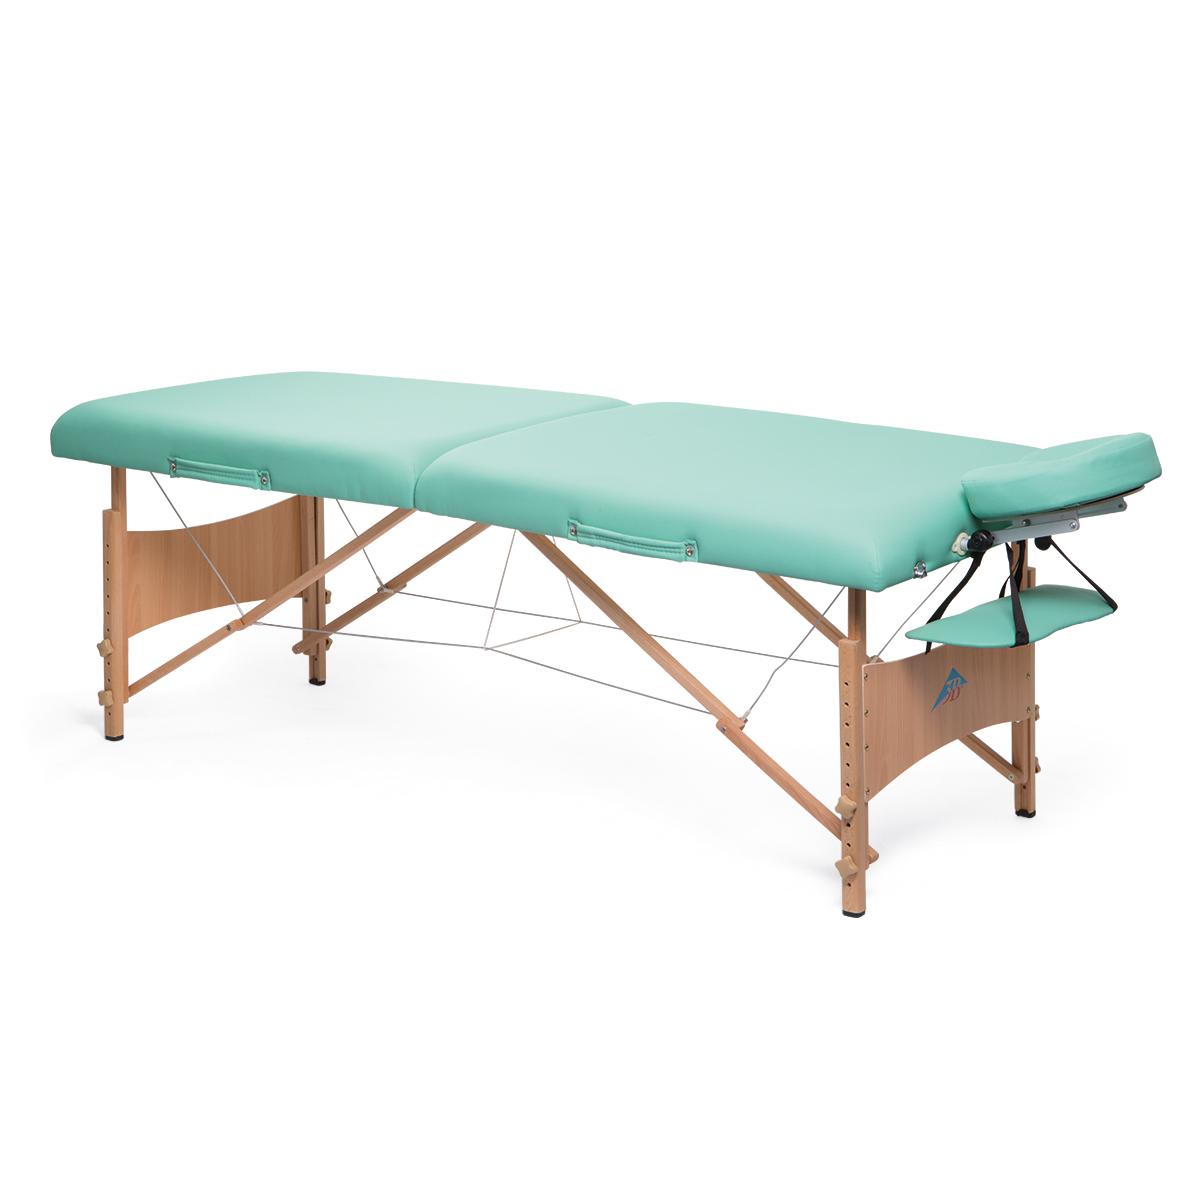 table de massage portable de luxe vert 1013728. Black Bedroom Furniture Sets. Home Design Ideas